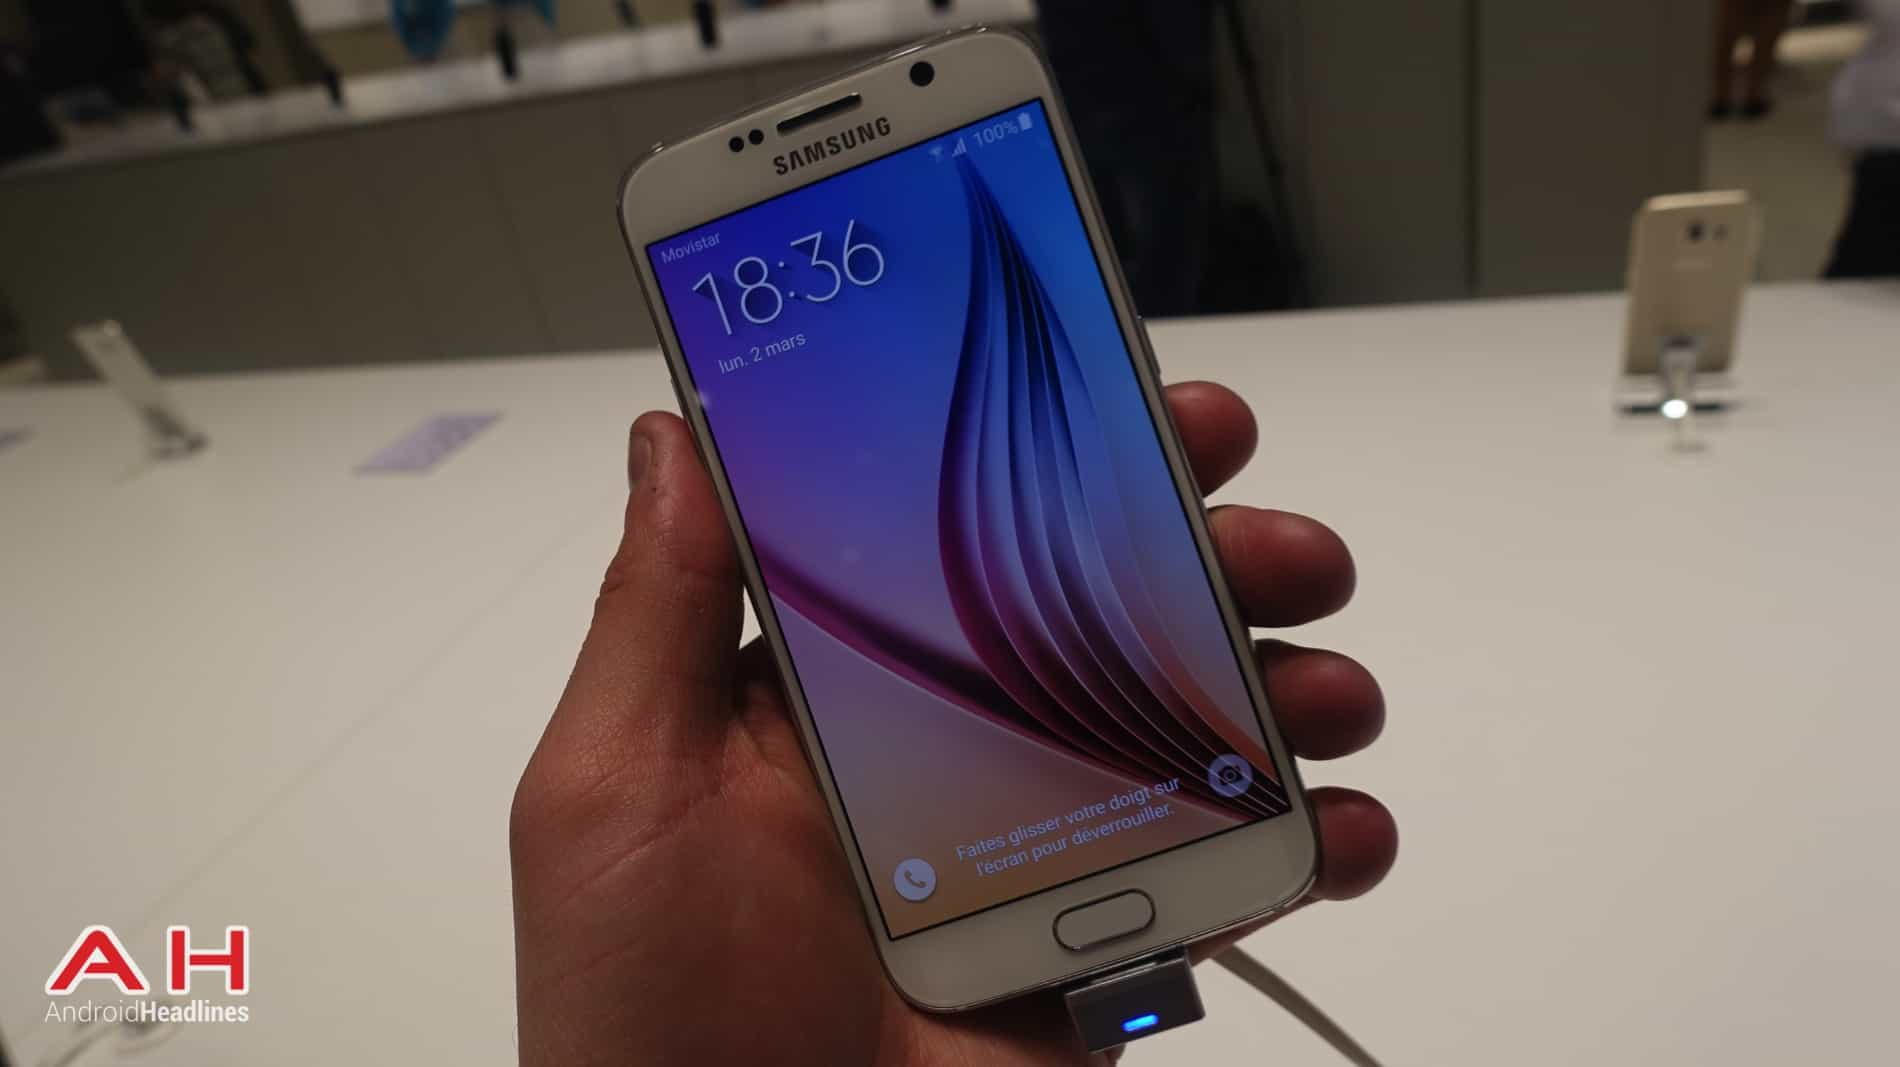 Galaxy S6 and Galaxy S6 Edge MWC AH 03